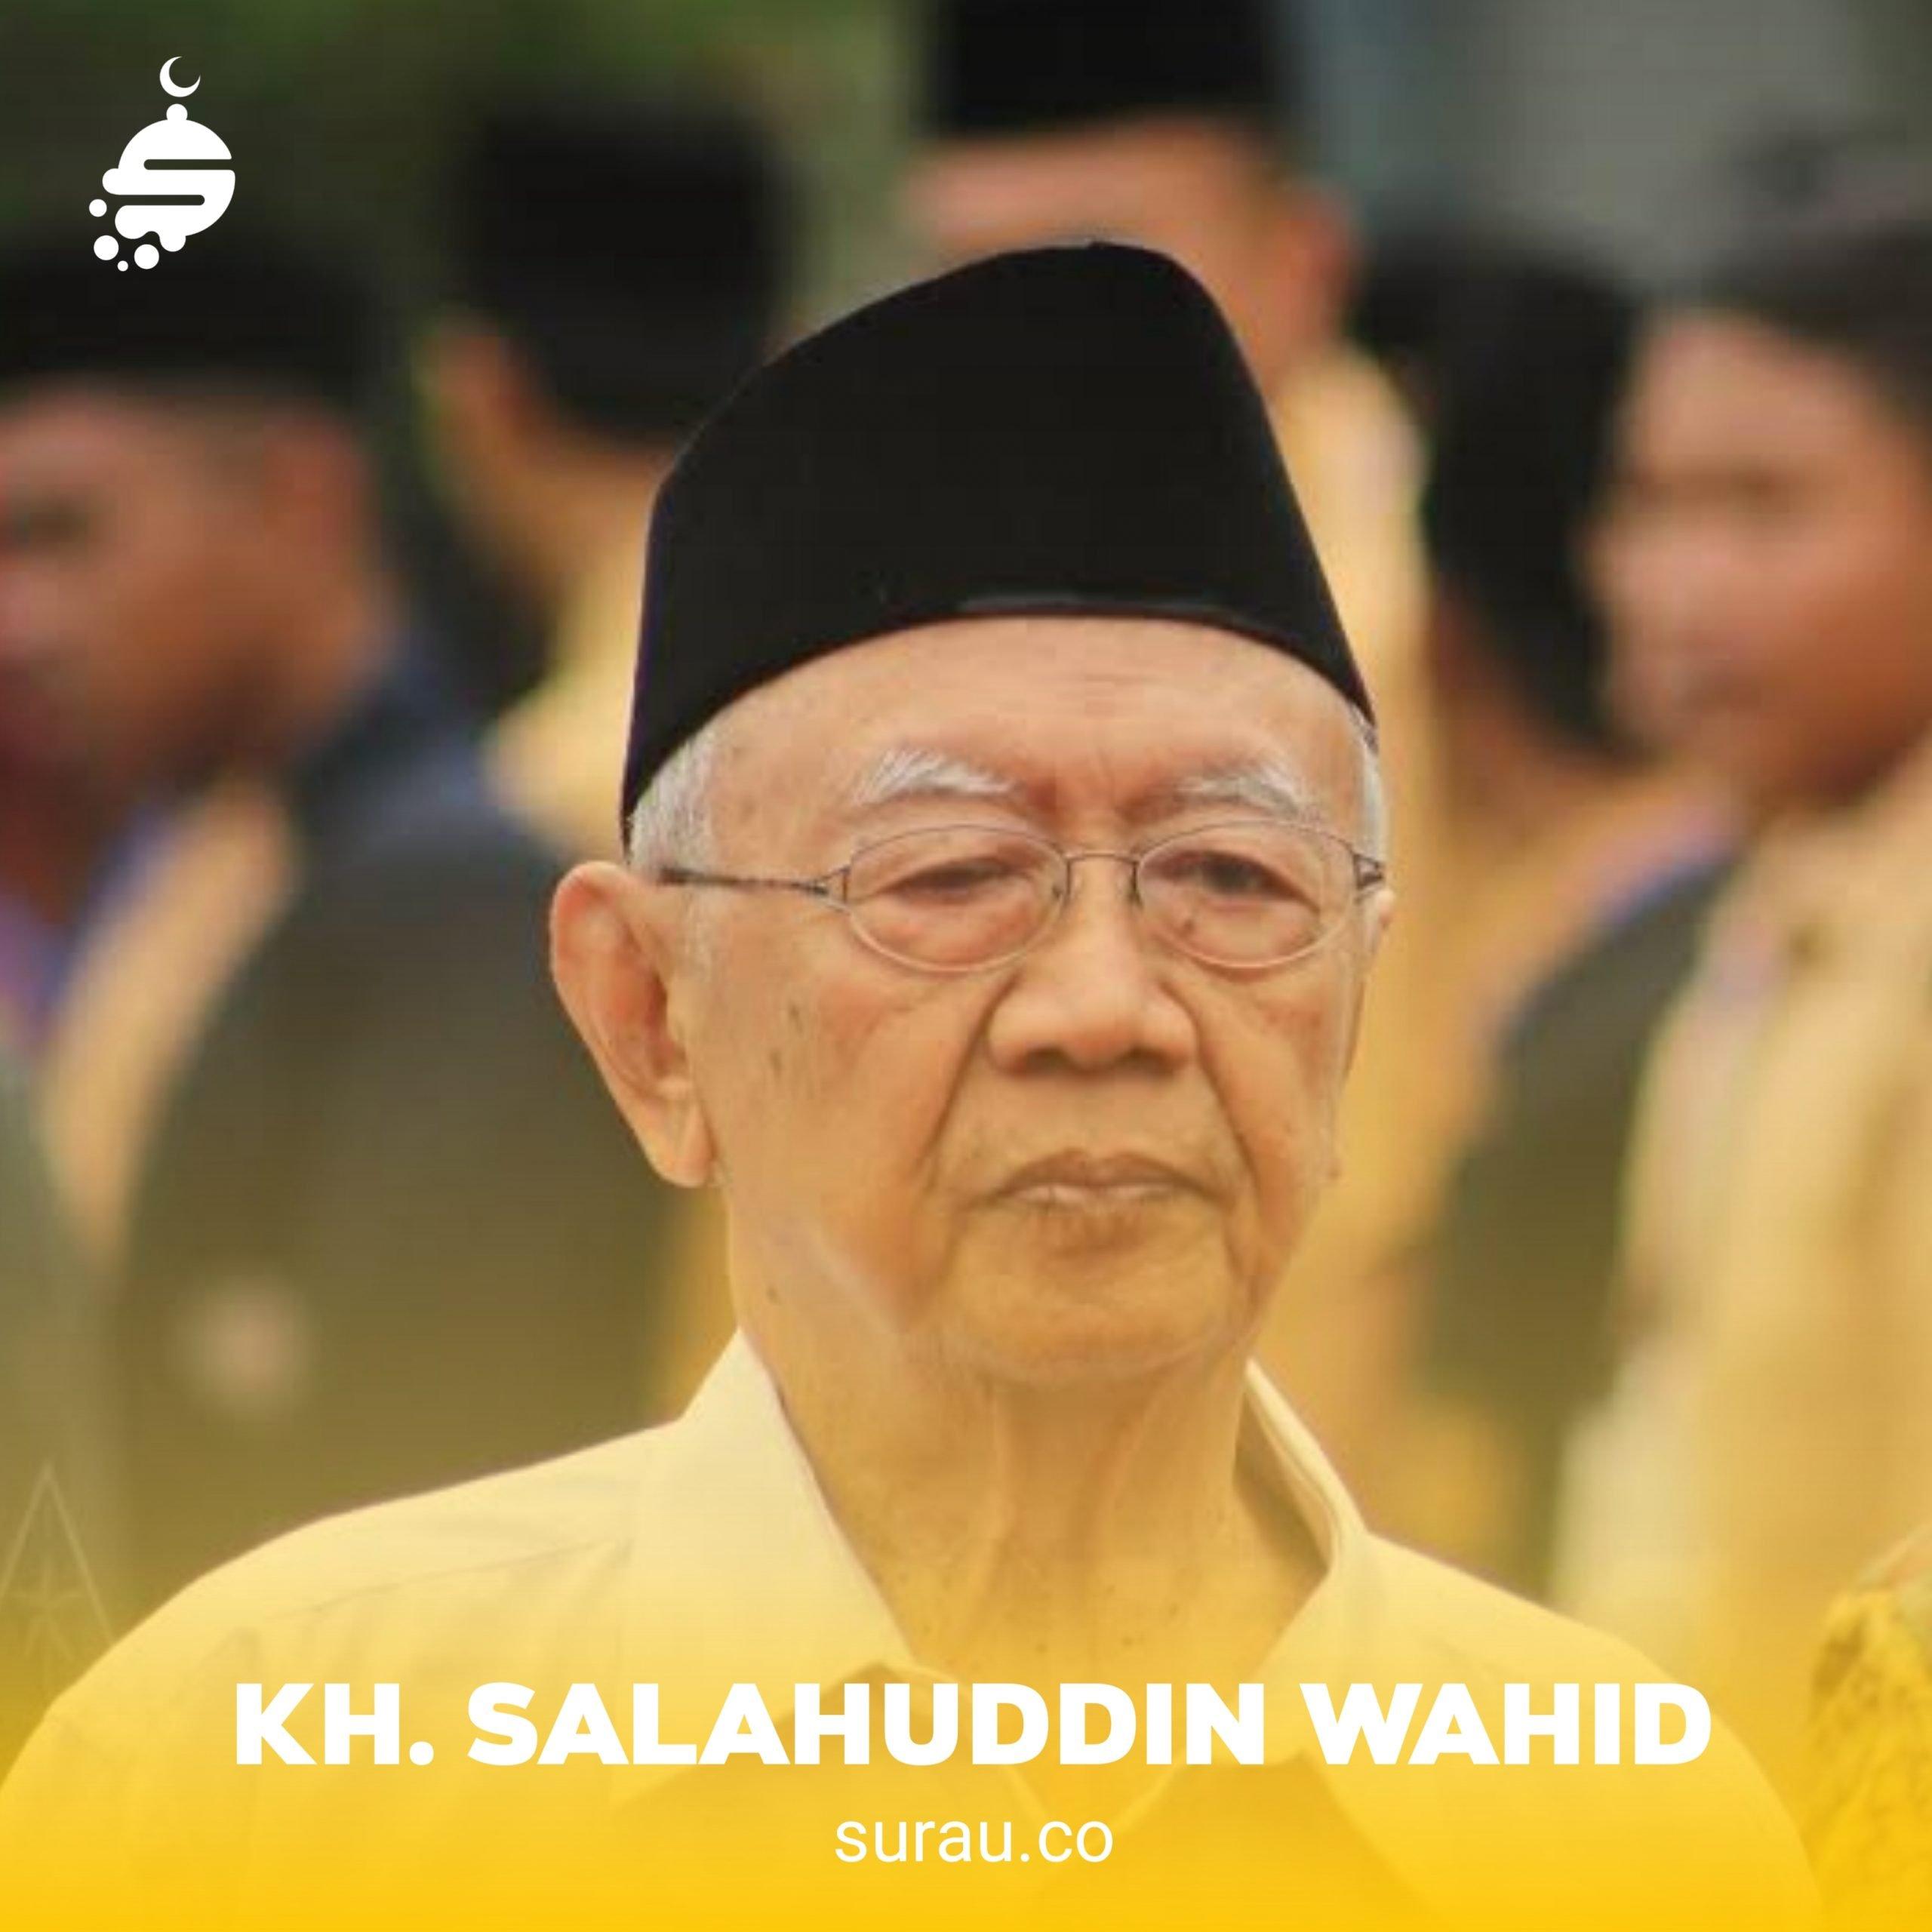 KH. Salahuddin Wahid